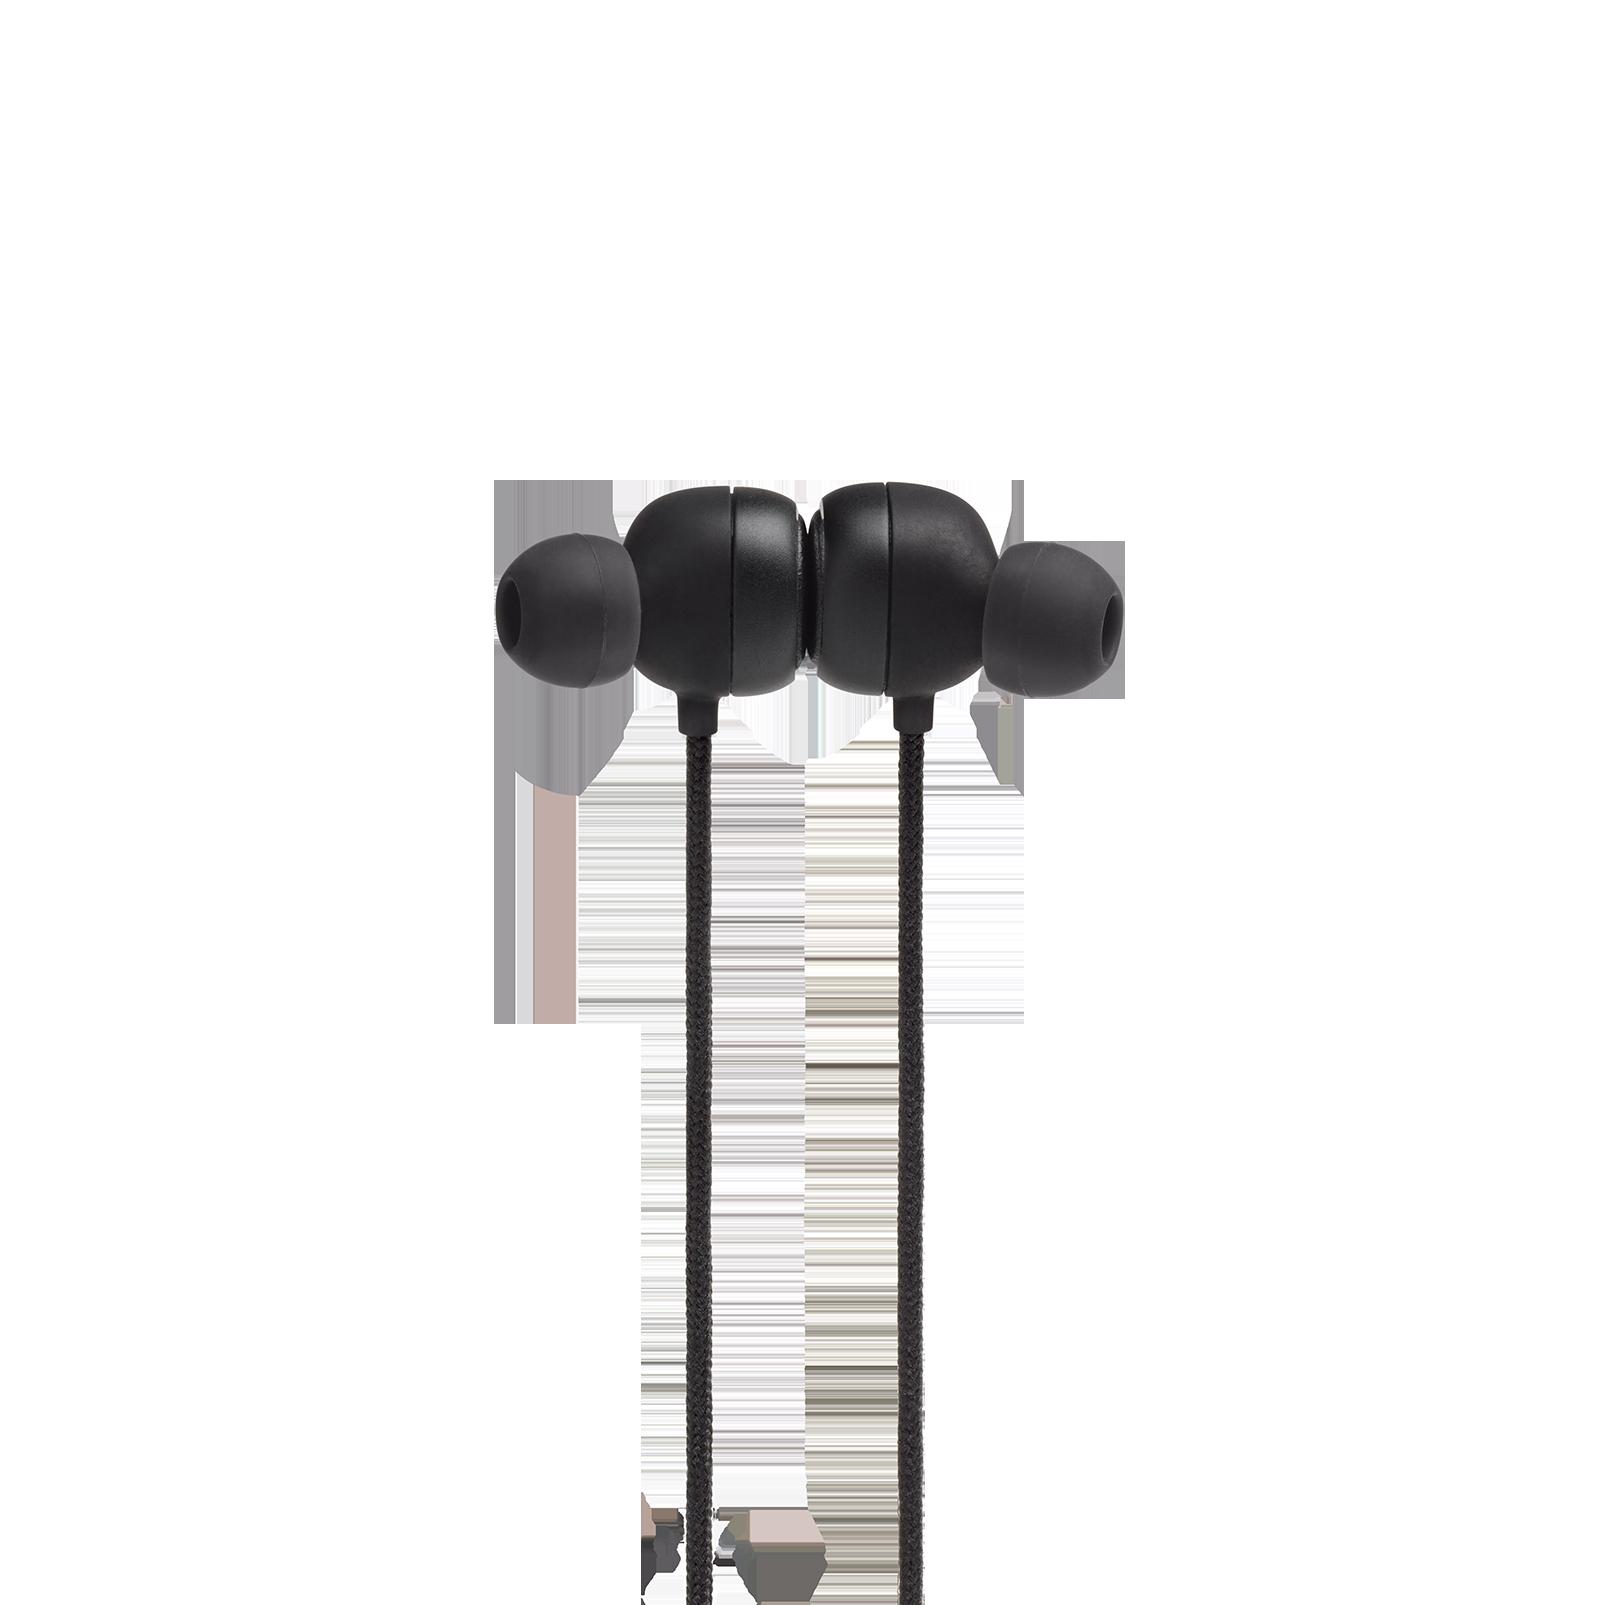 Harman Kardon FLY BT - Black - Bluetooth in-ear headphones - Detailshot 3